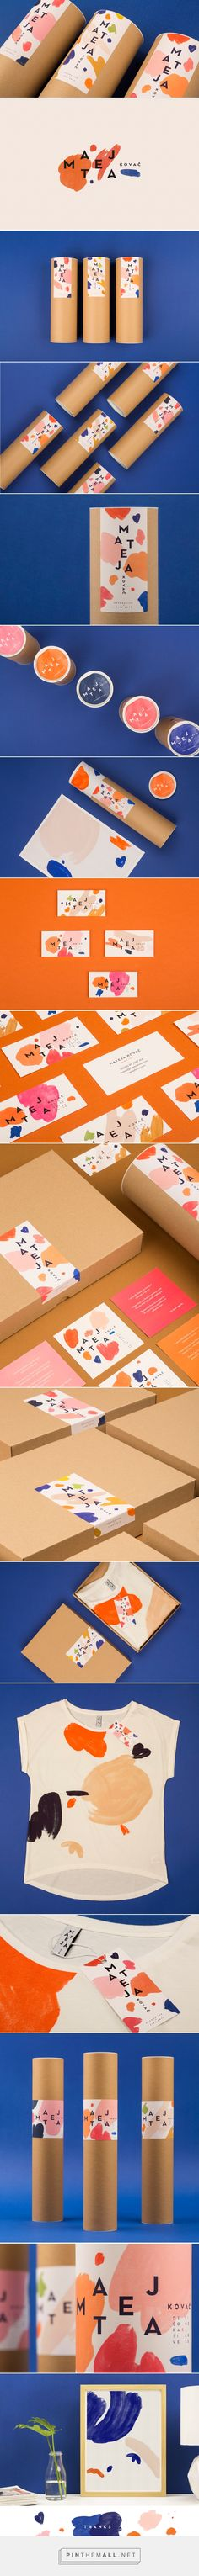 MATEJA KOVAČ / Visual identity on Behance Love the colors and bold pattern use in the brand identity Brand Identity Design, Graphic Design Branding, Corporate Design, Branding Agency, Business Branding, Logo Branding, Packaging Inspiration, Inspiration Logo Design, Vintage Logo